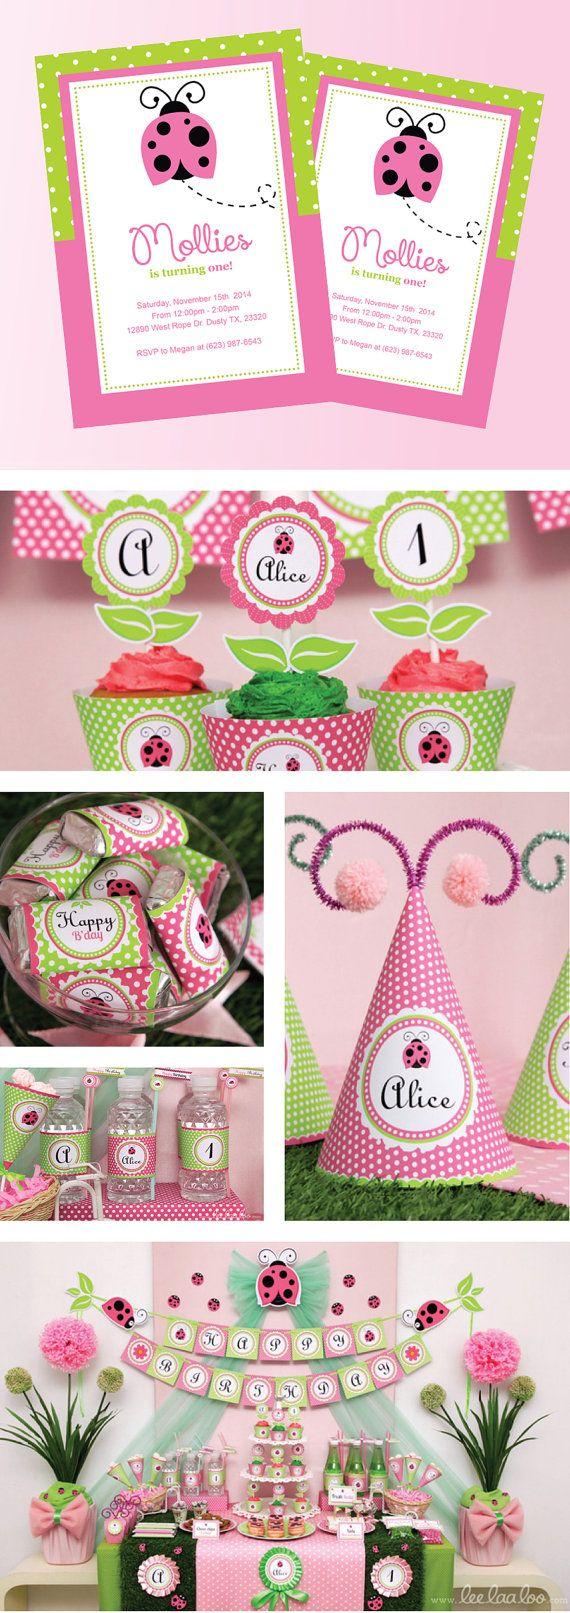 Best 25+ Pink ladybug birthday ideas on Pinterest | DIY ladybug ...